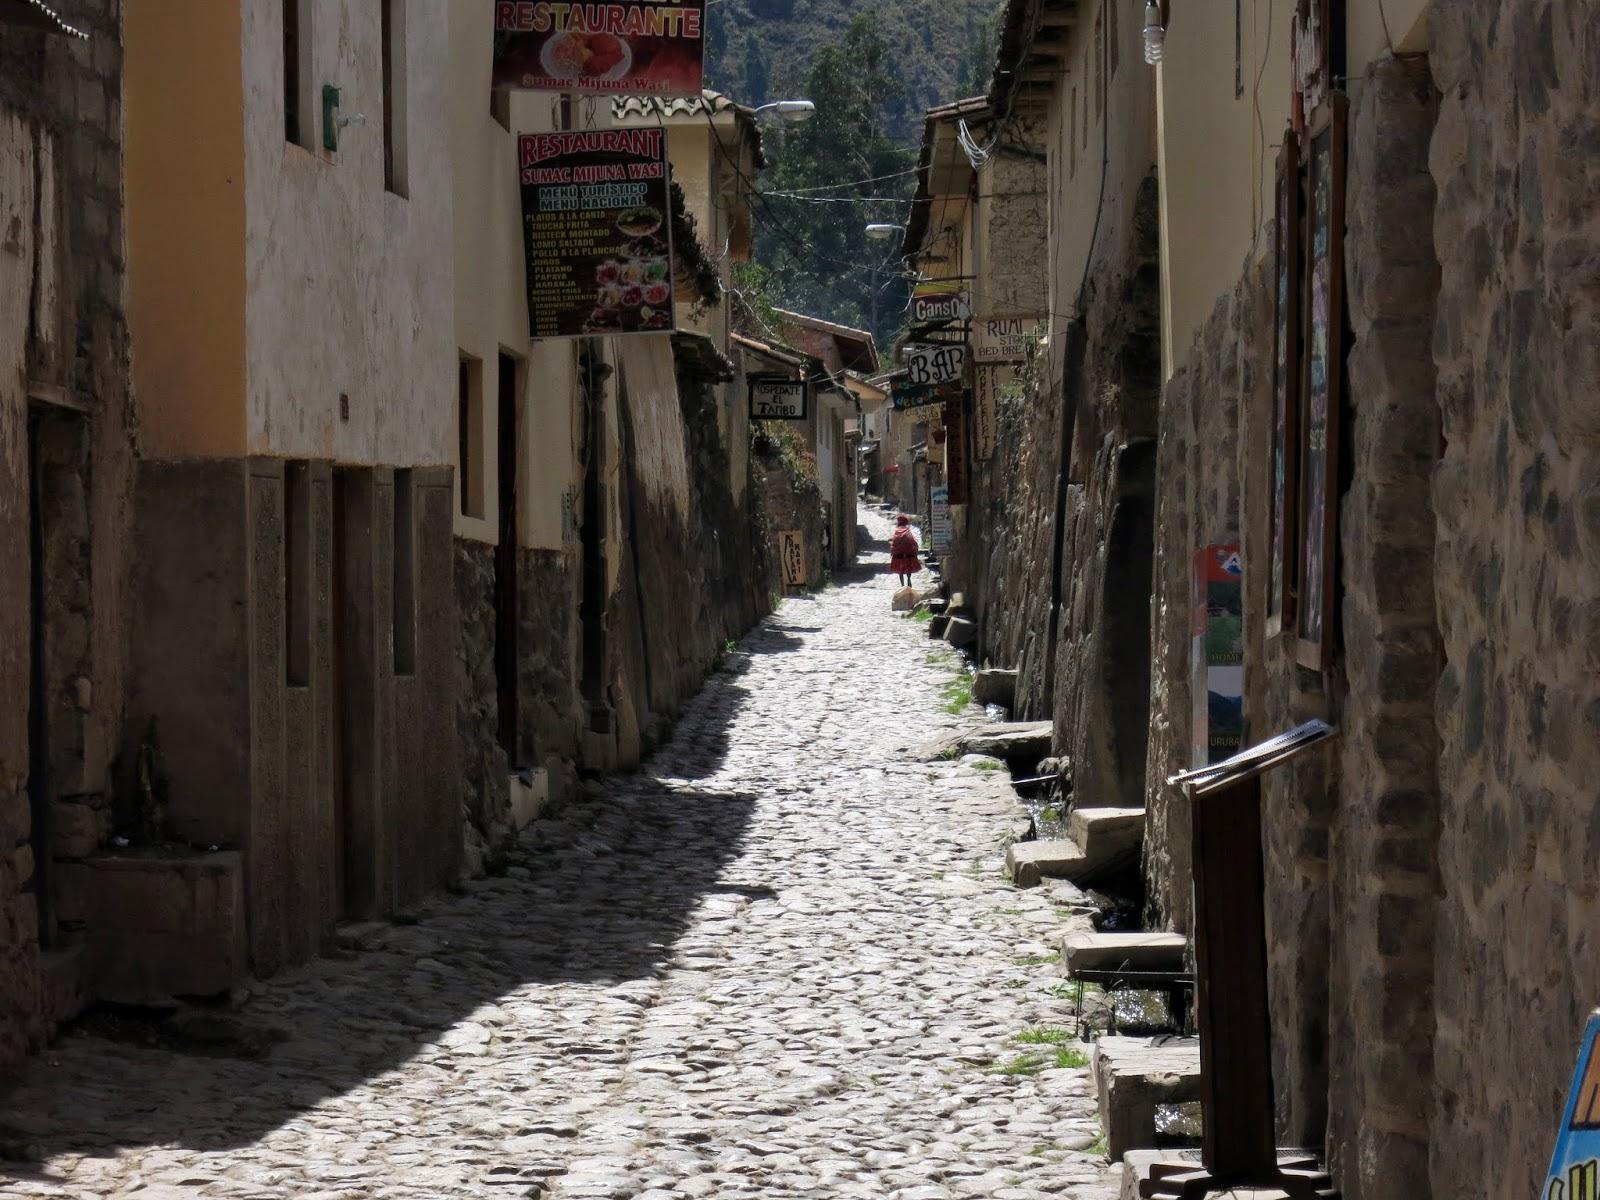 Calles del casco histórico de Ollantaytambo